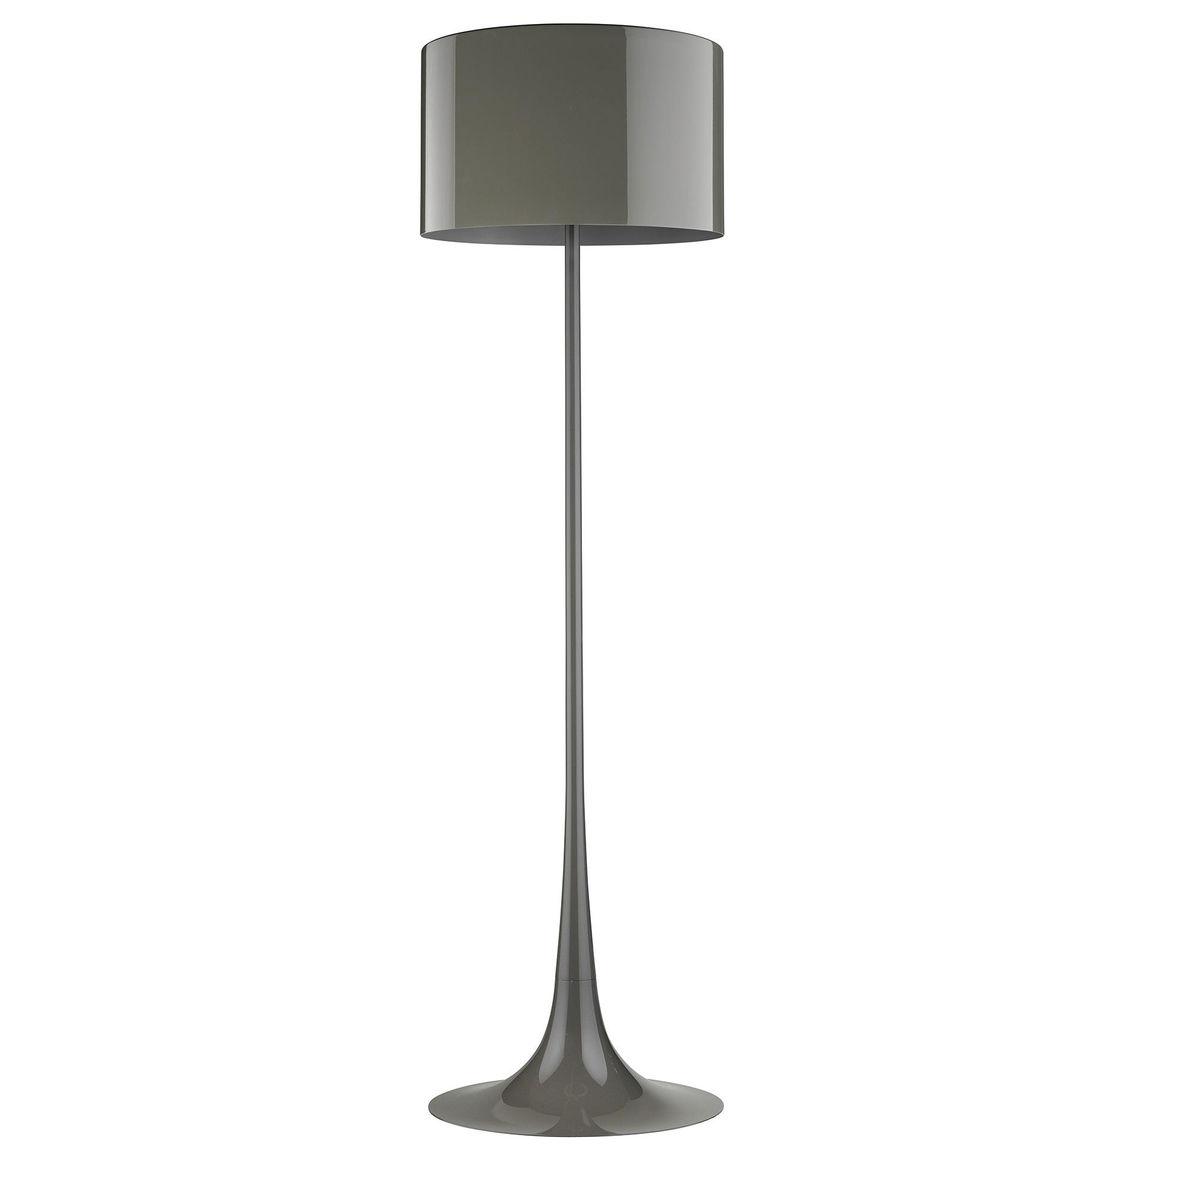 spun light f lampadaire flos lampadaires luminaires. Black Bedroom Furniture Sets. Home Design Ideas